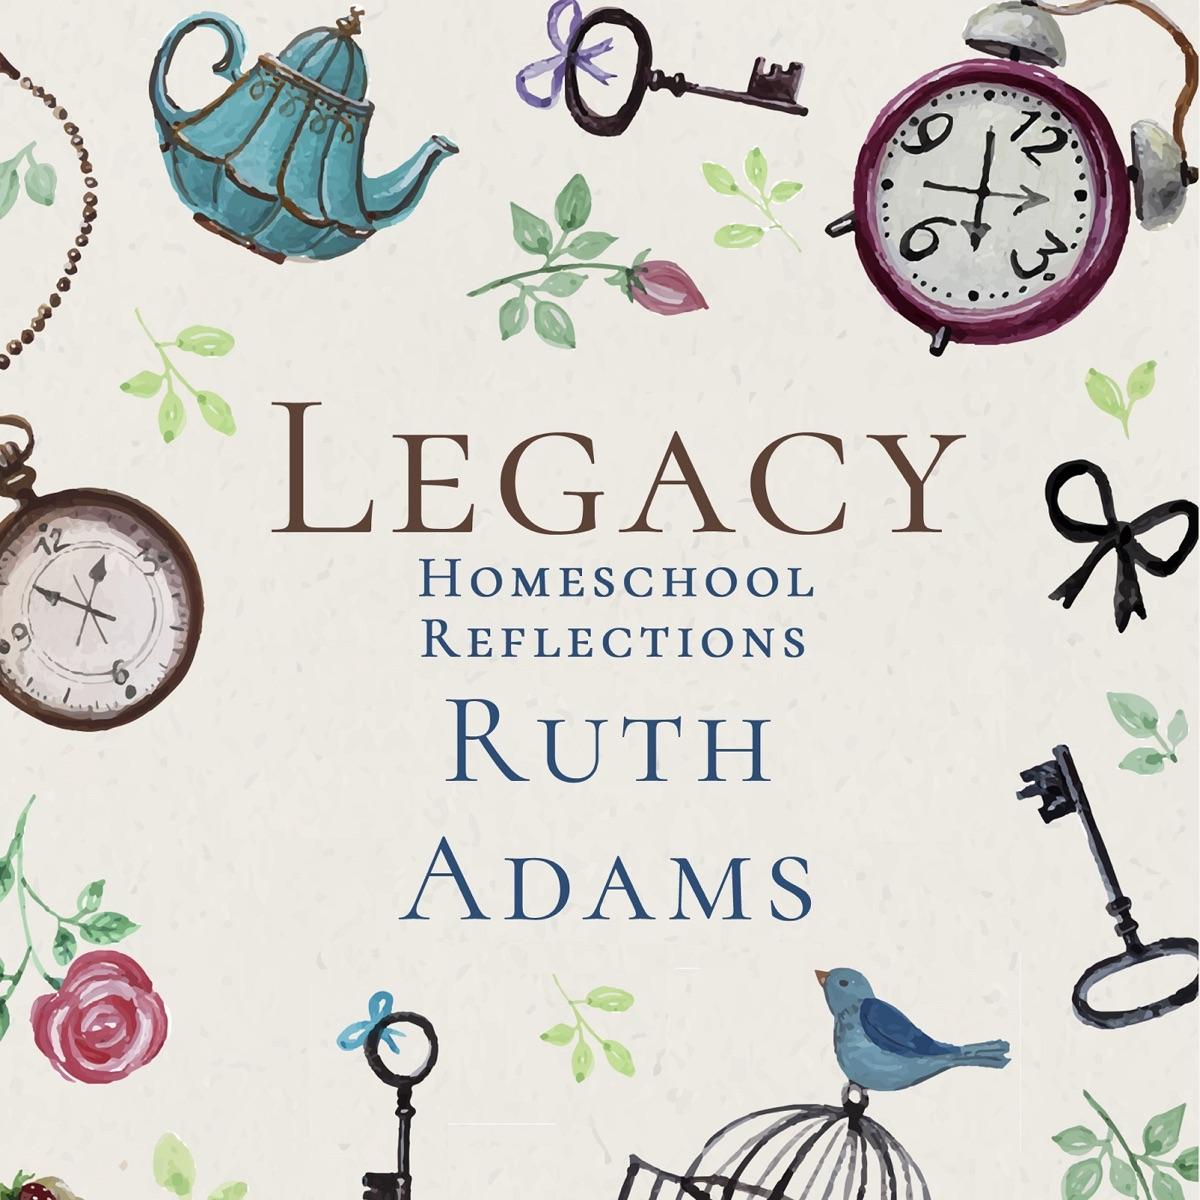 Legacy Homeschool Reflections Podcast